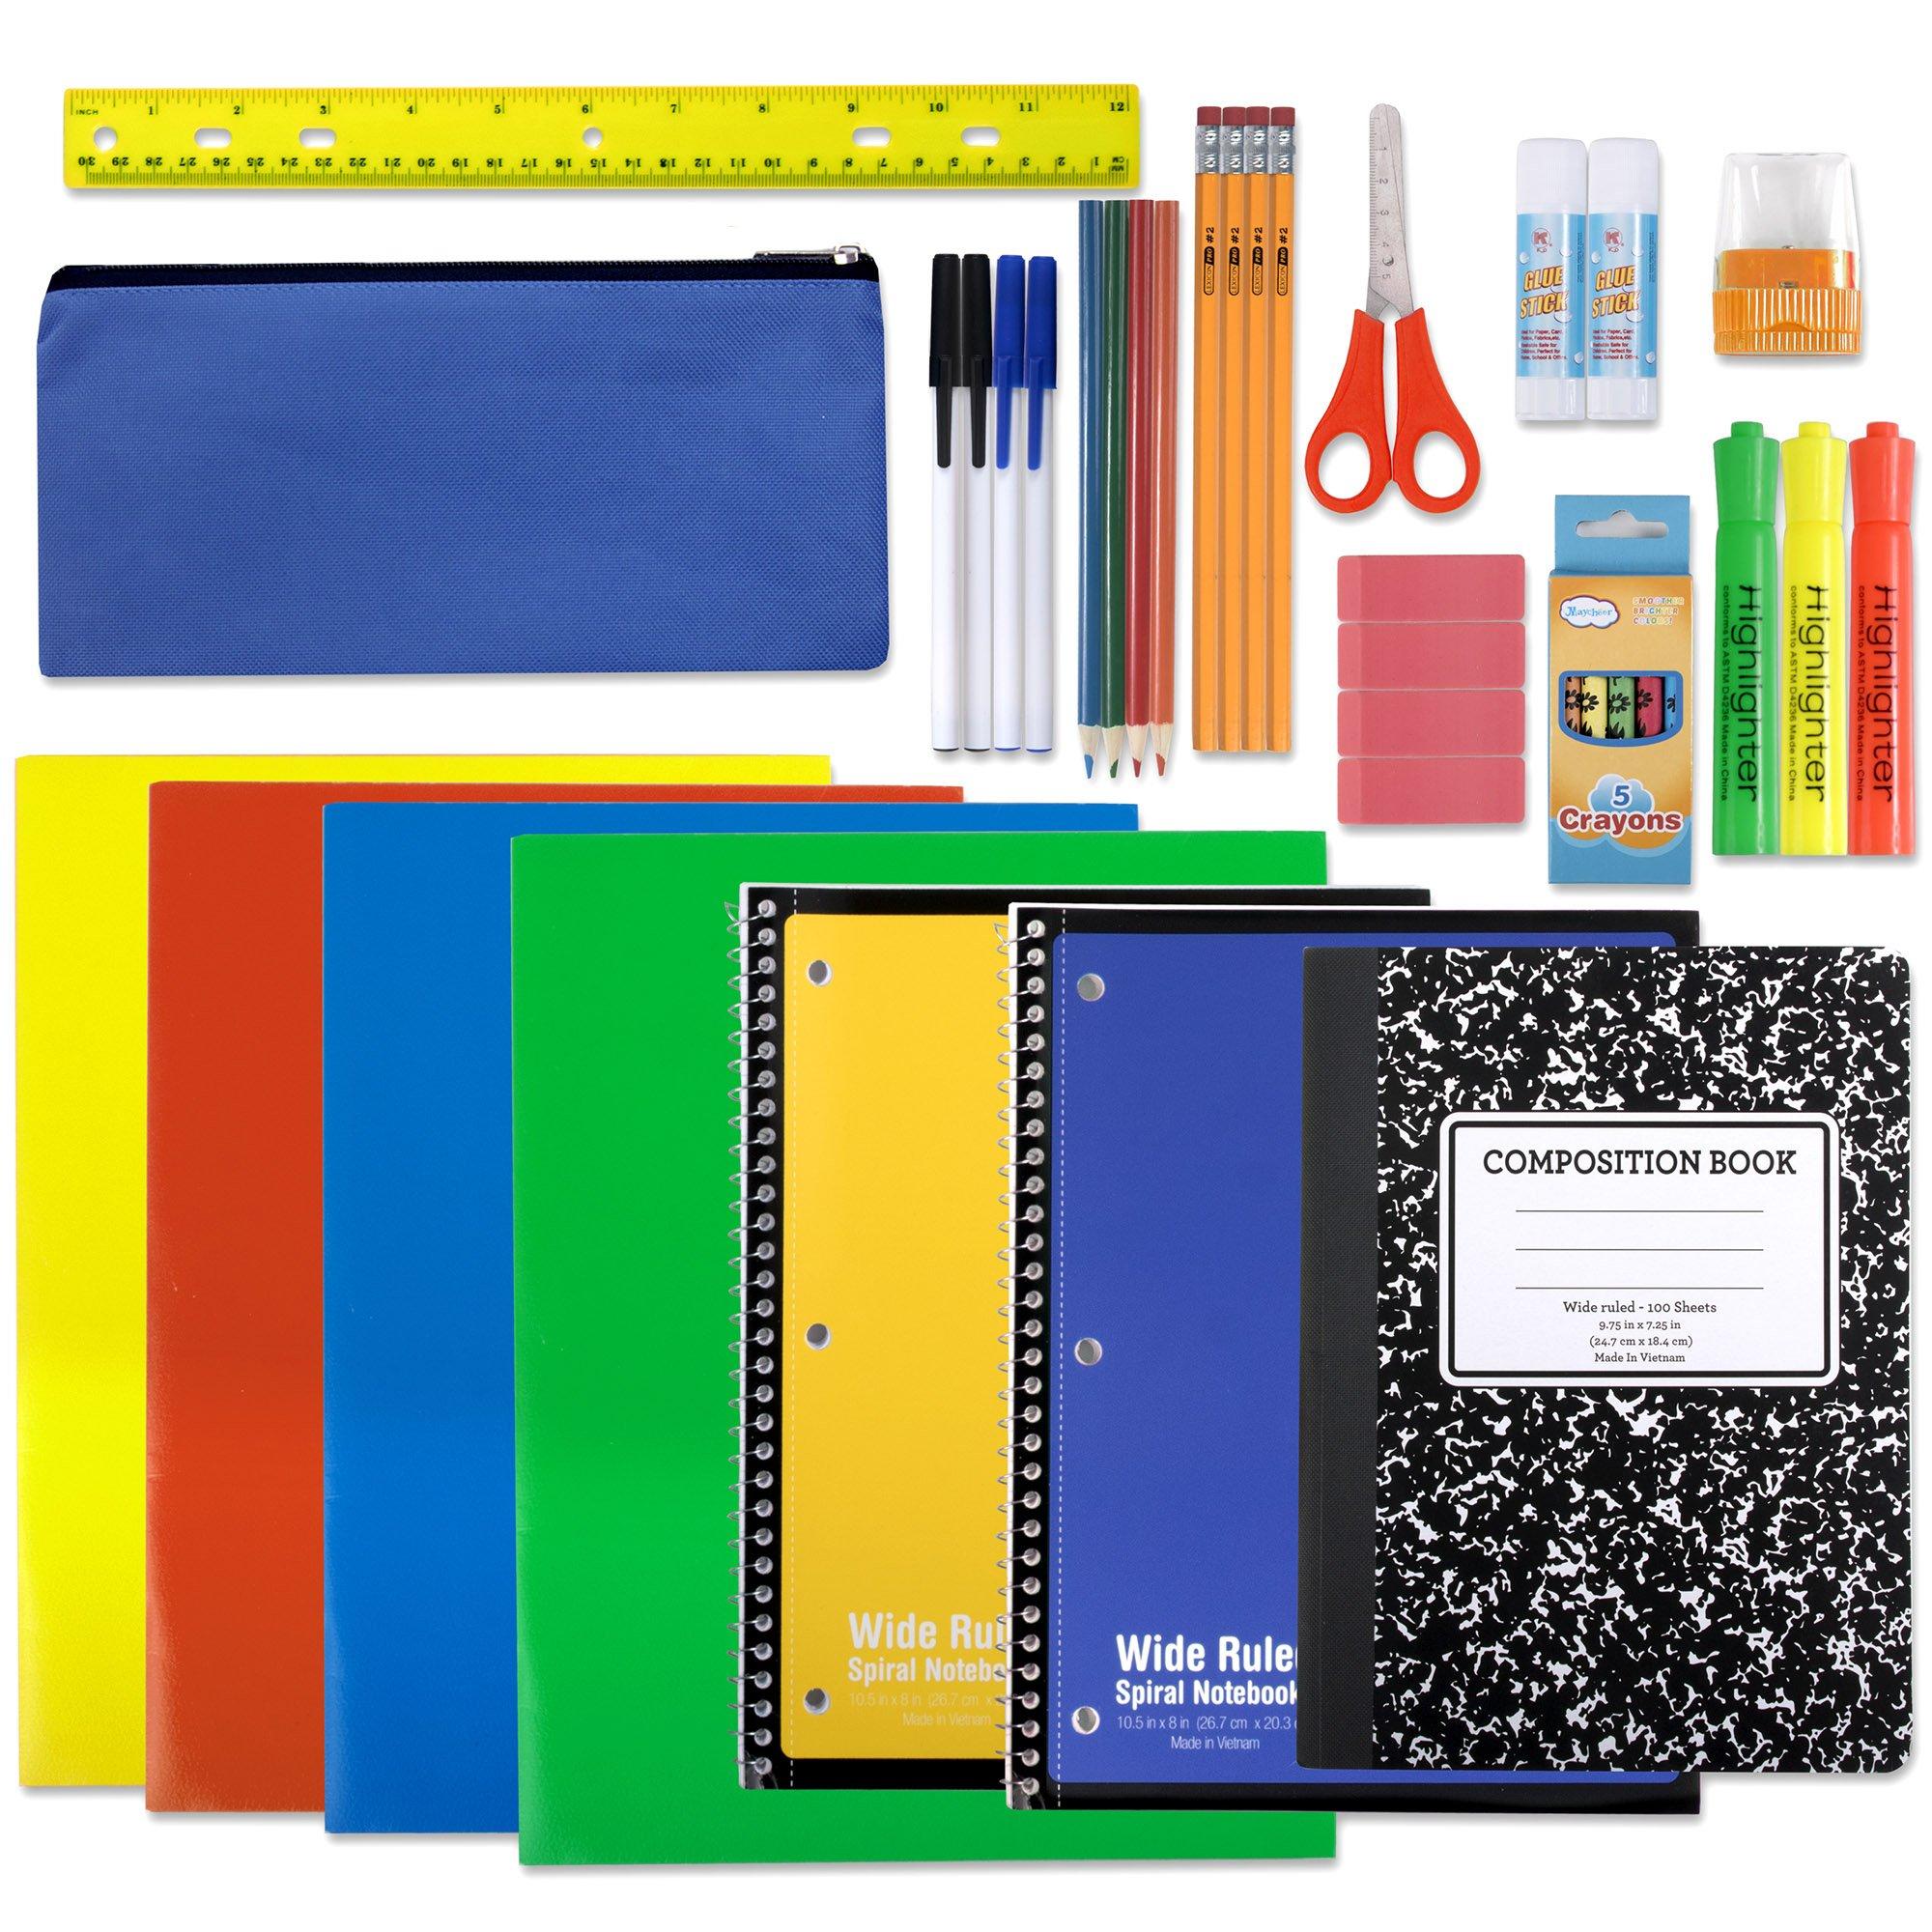 School Supply Kit: Folder Subject Spiral Notebook Composition Book Colored Pencil Pouch Ruler Pen Blunt Tip Scissor Eraser Glue Stick Crayon Sharpener Highlighter | K-8 Elementary Grade (24 Piece)